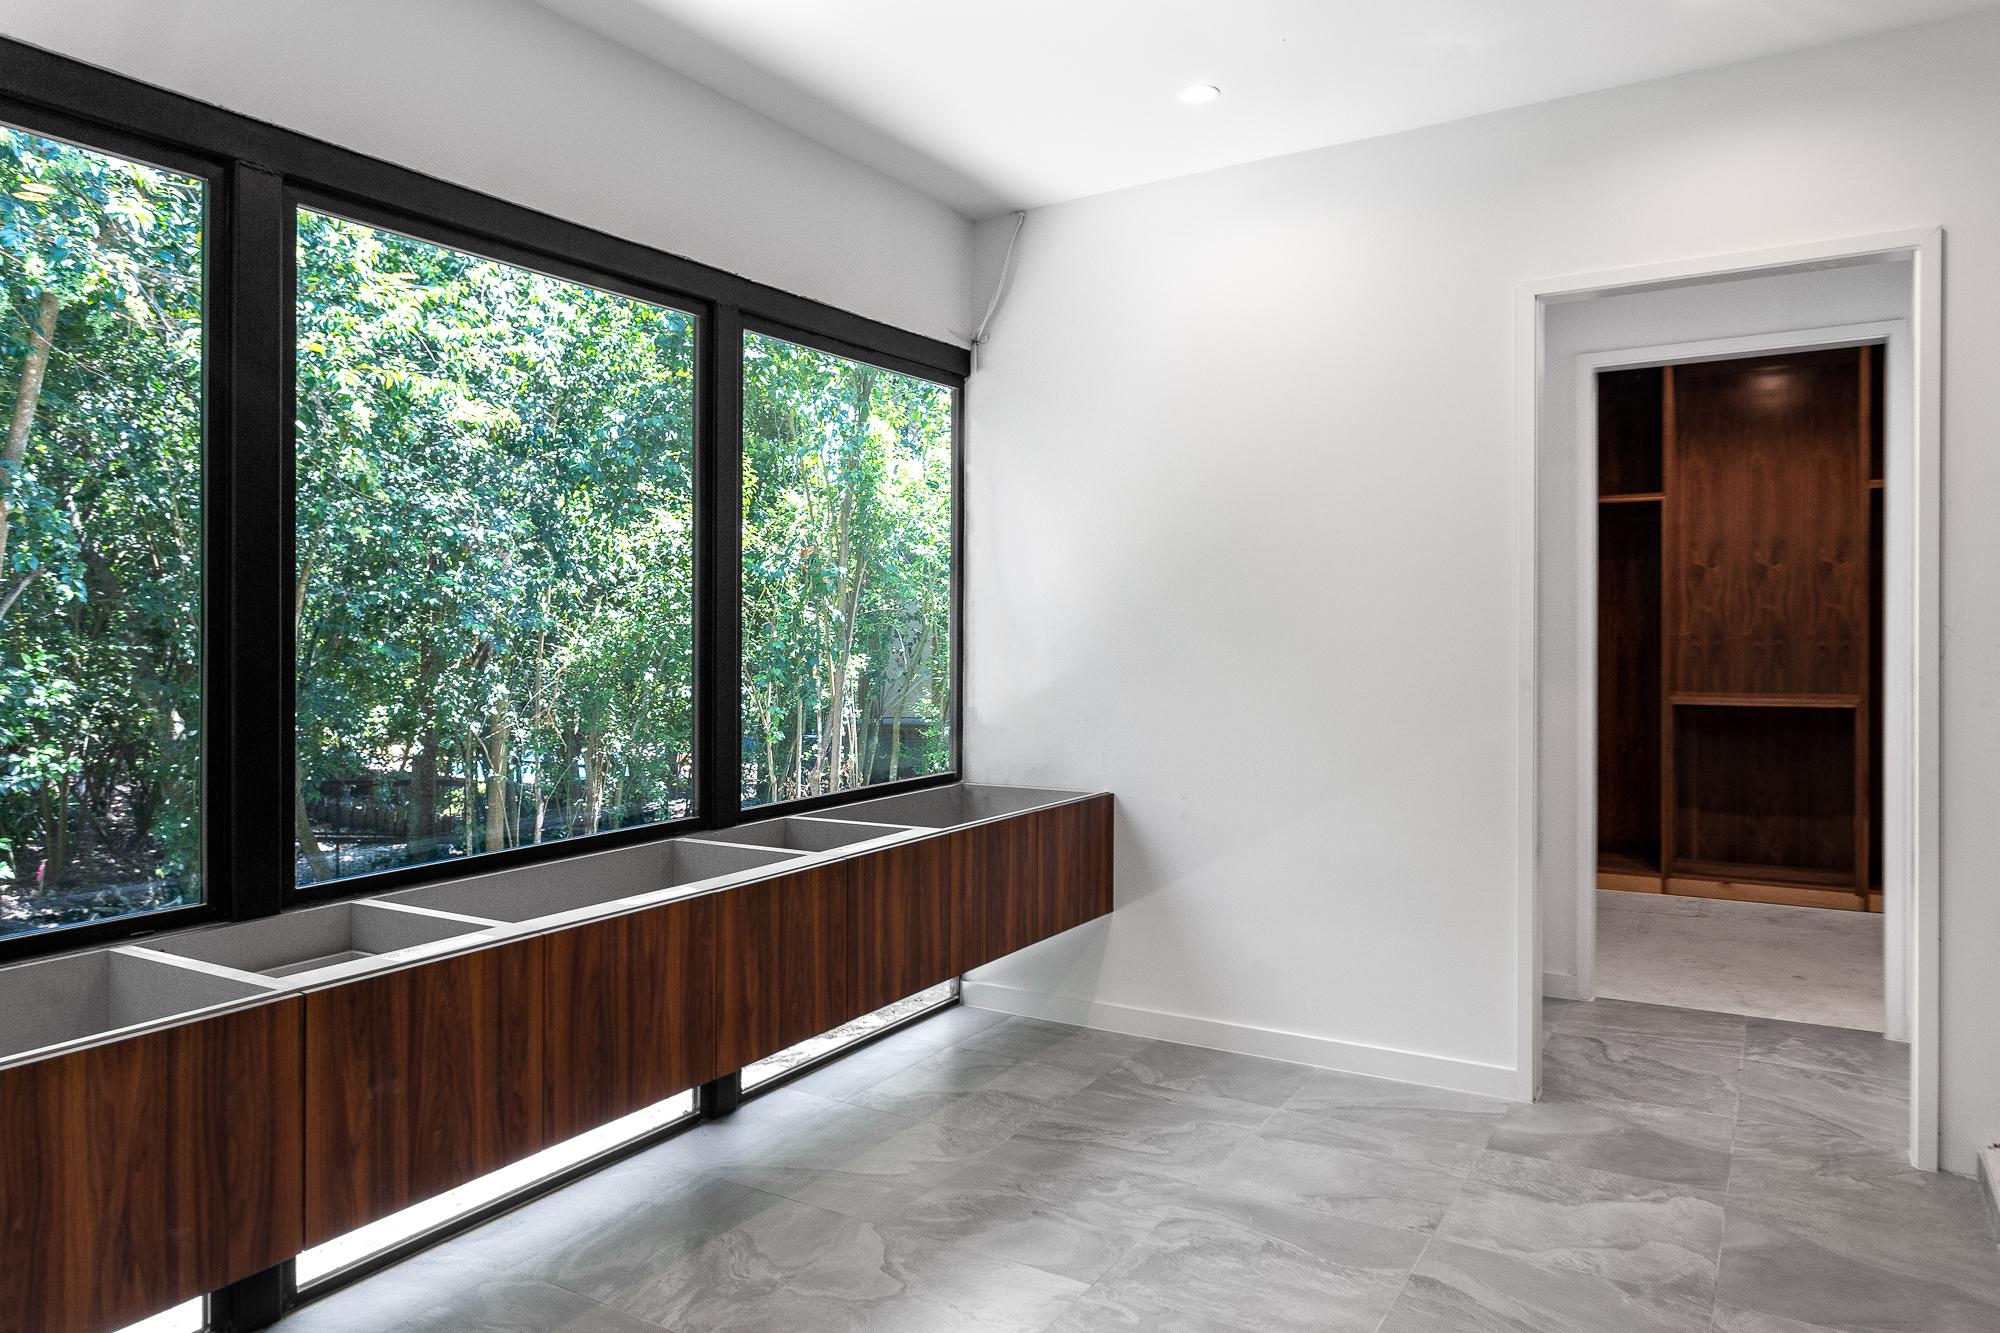 Woodridge-San-Antonio-Architecture-Photography-4.jpg